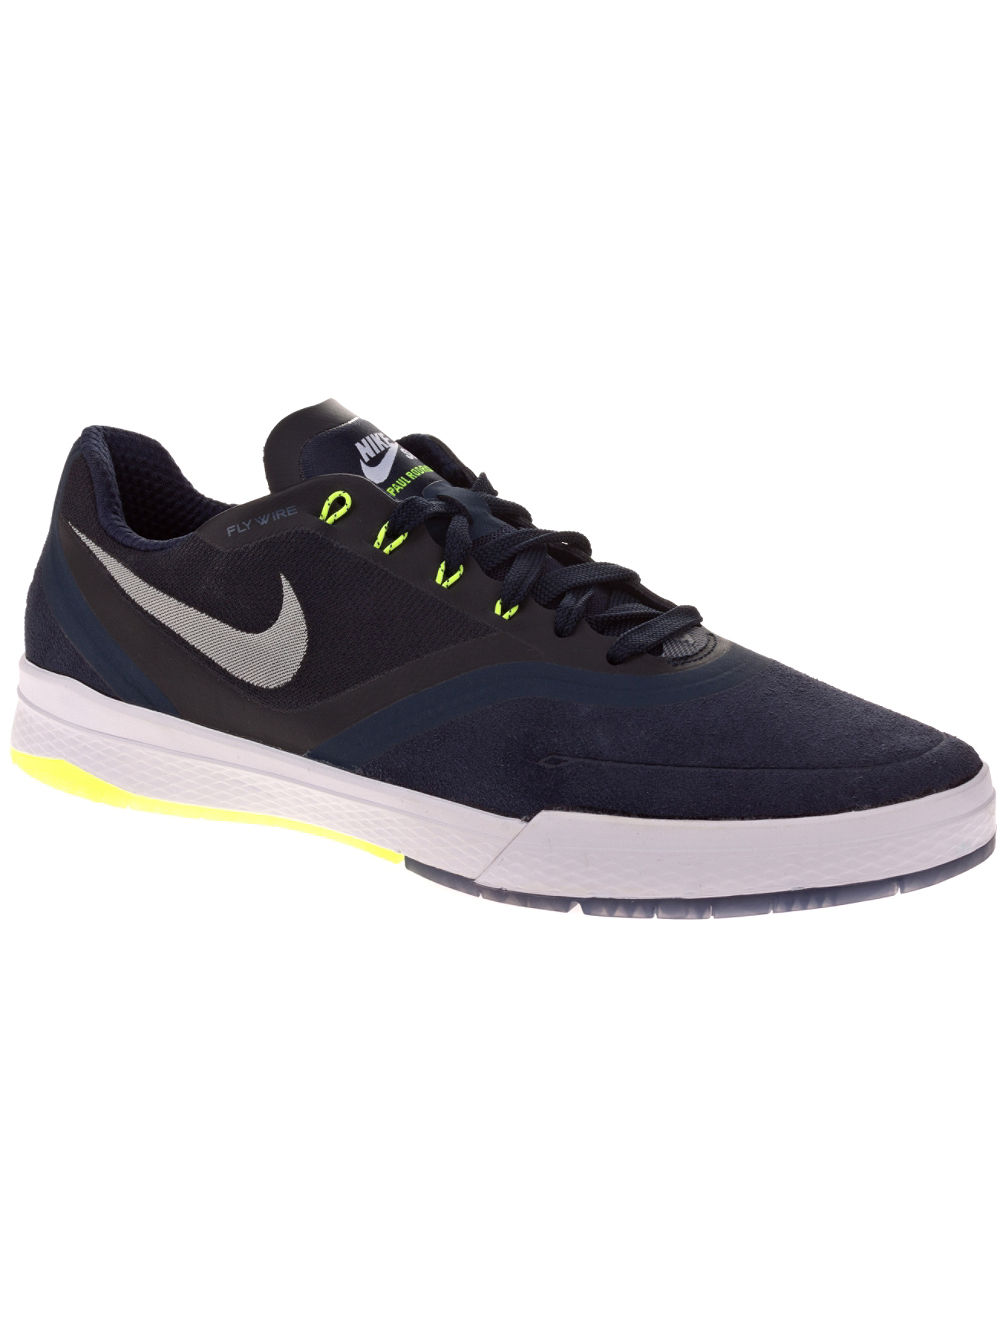 Nike Paul Rodriguez 9 Elite Scarpe da skate - nike - blue-tomato.com